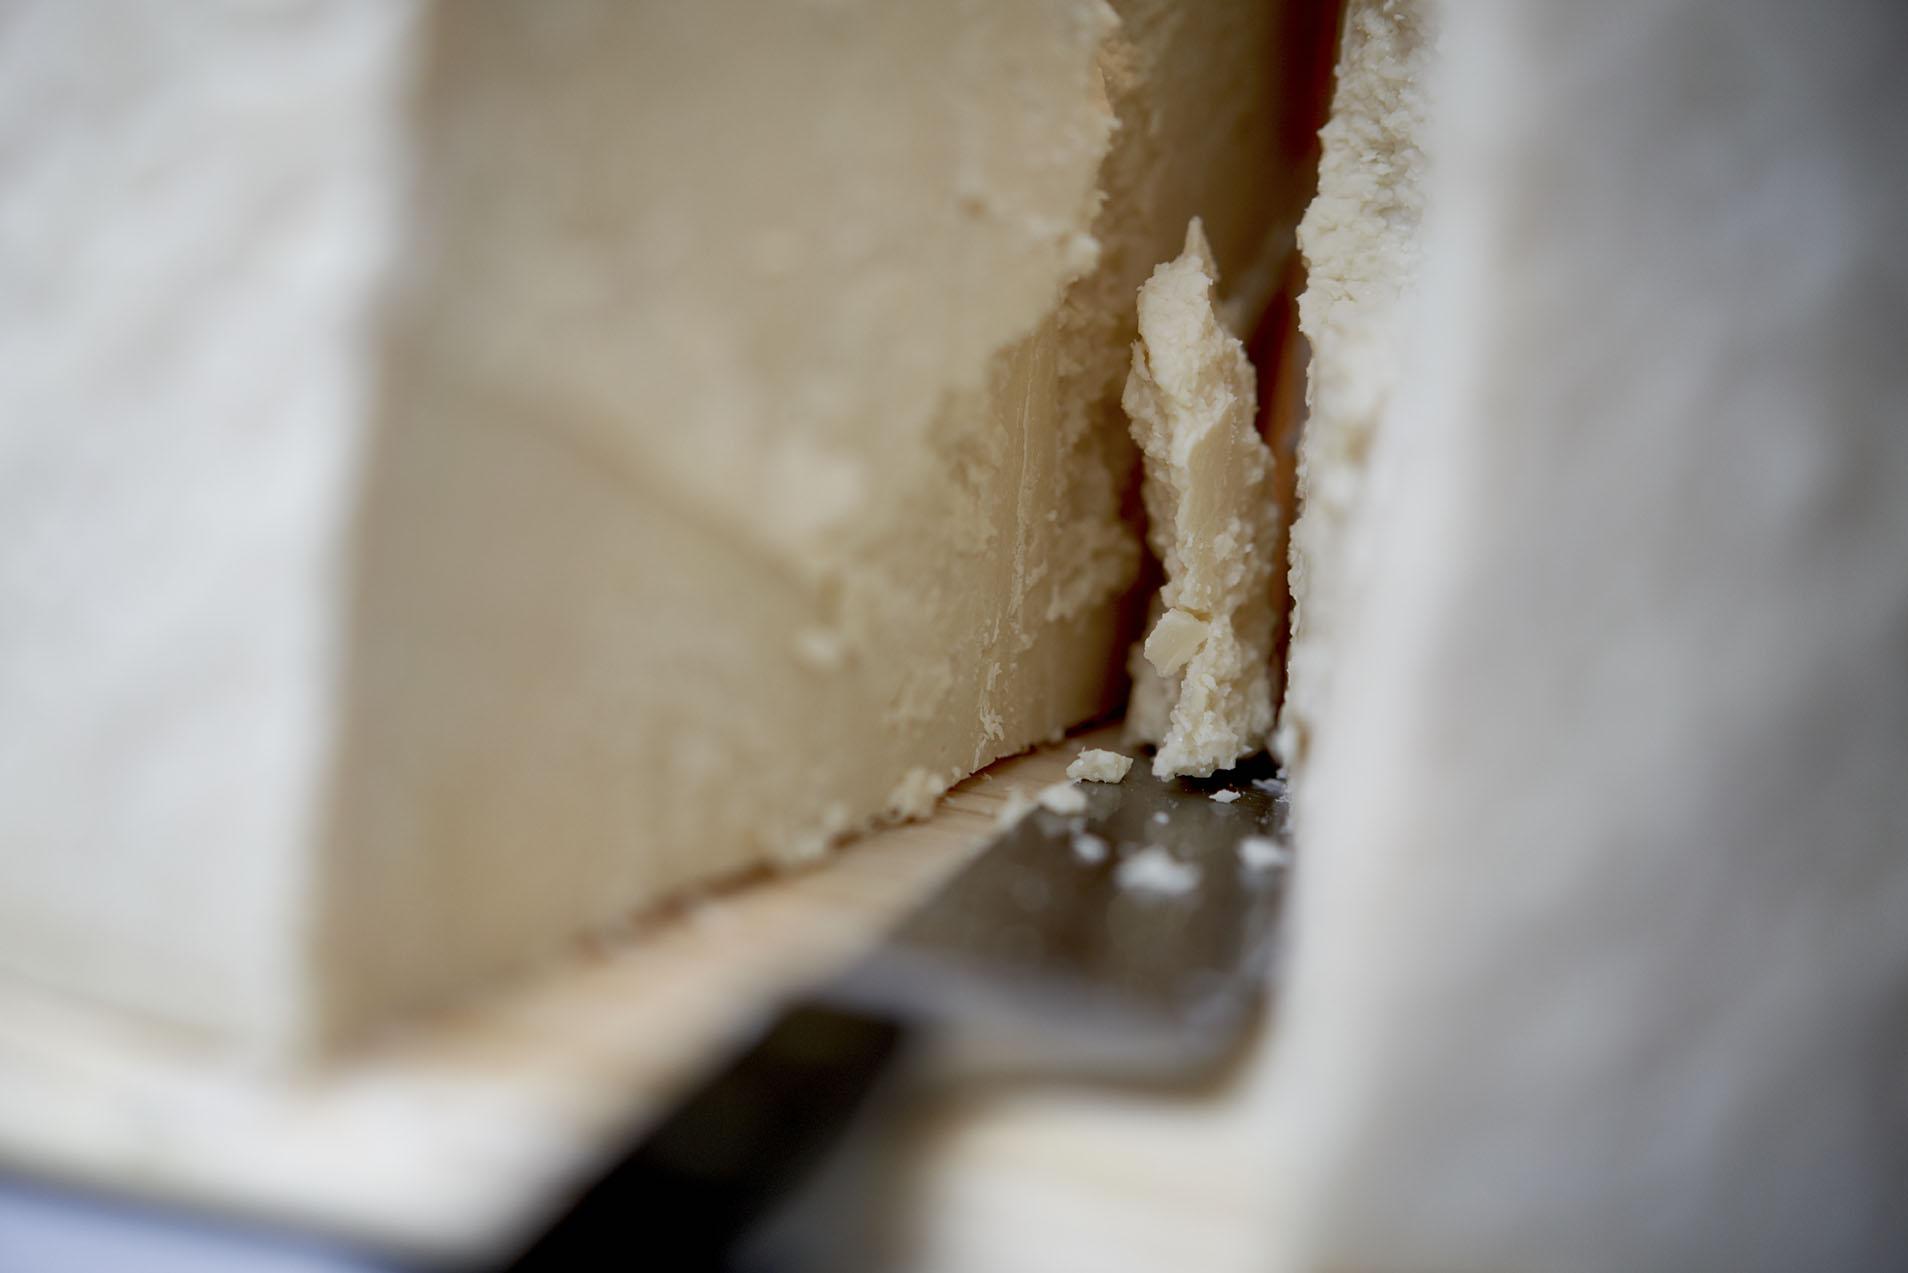 Ingredients_04_SimoPizza_FSP7730 HighRes Q100.jpg